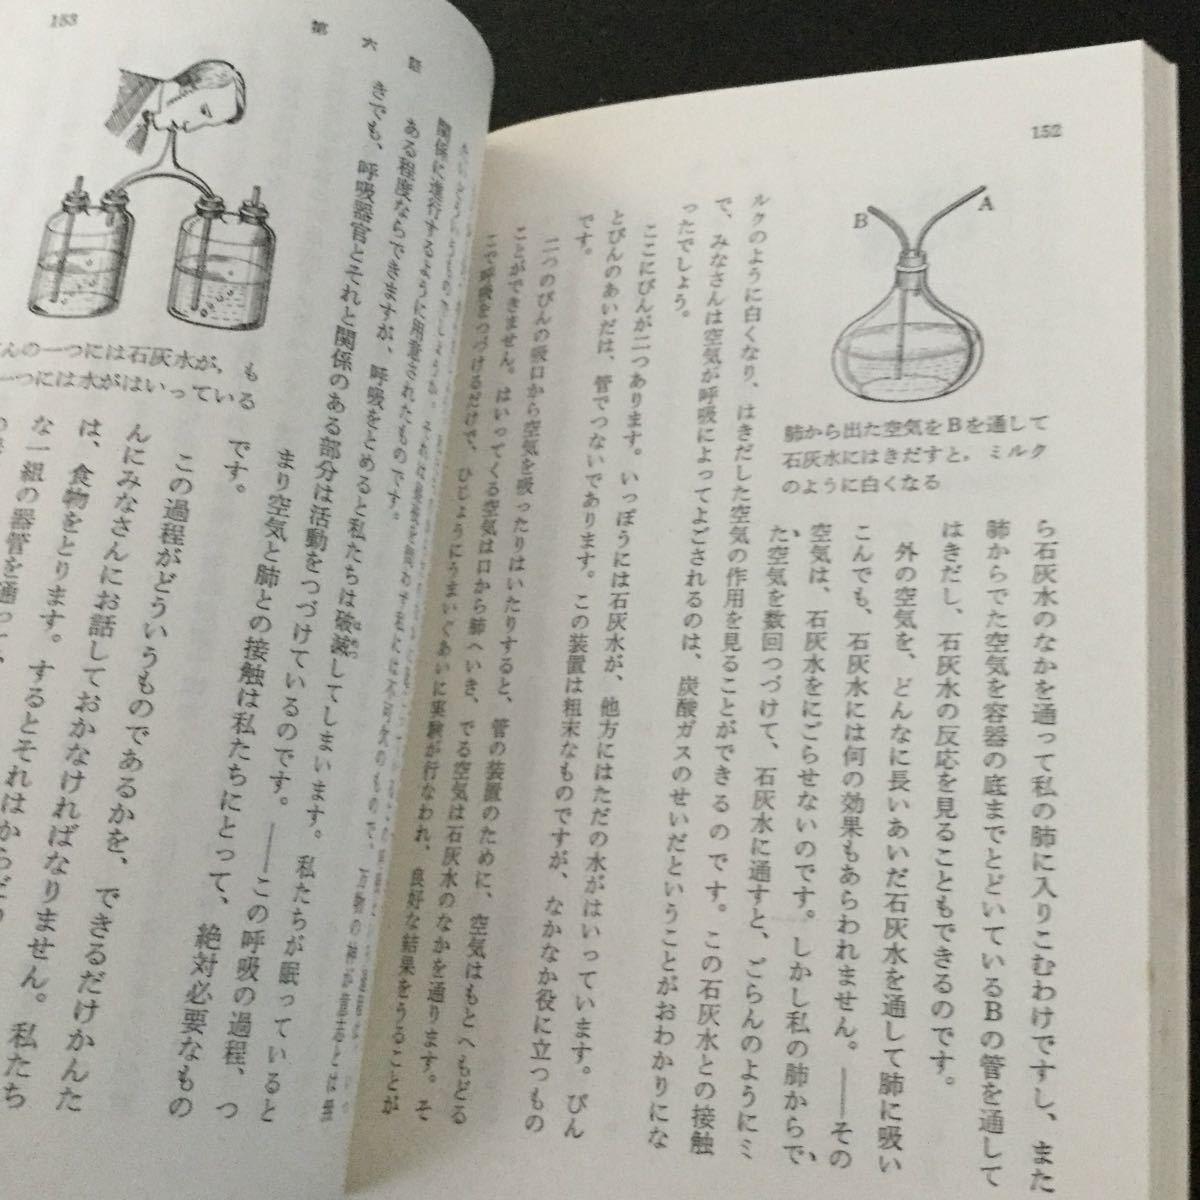 a37 ロウソクの科学 ファラデー 日下実男 小説 旺文社文庫 旺文社 _画像9